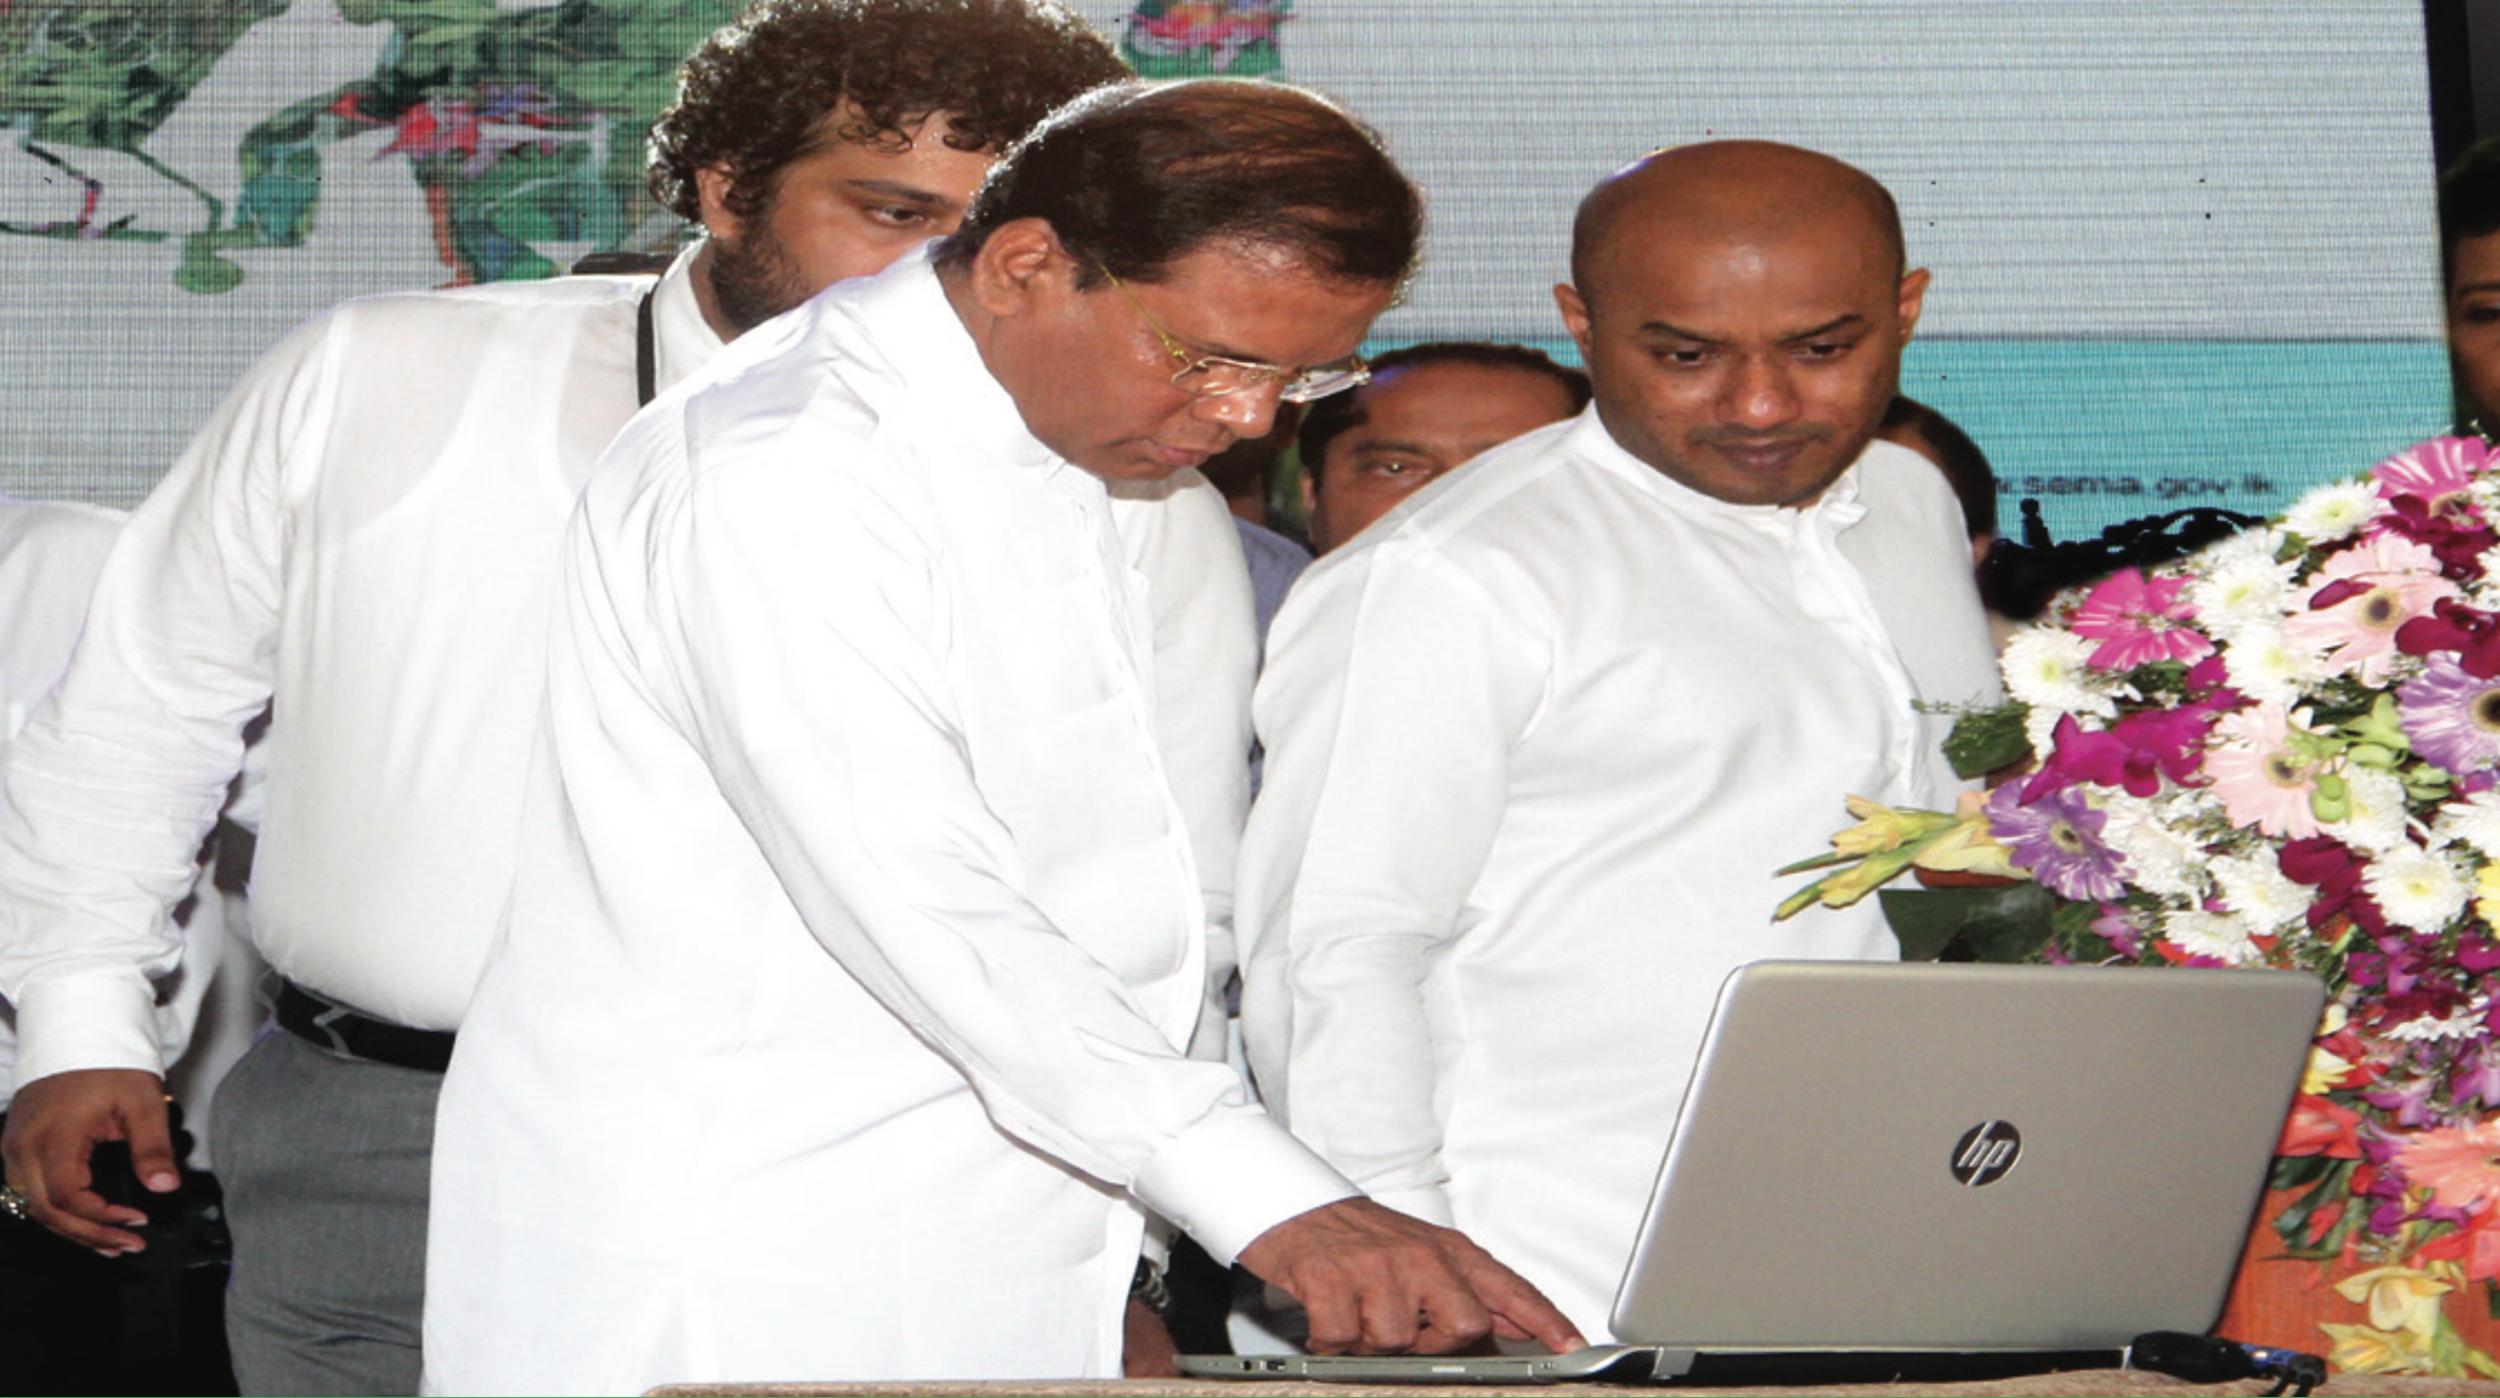 His Excellency The President of Sri Lanka Maithripala Sirisena Launching Astrocrop in Sri Lanka